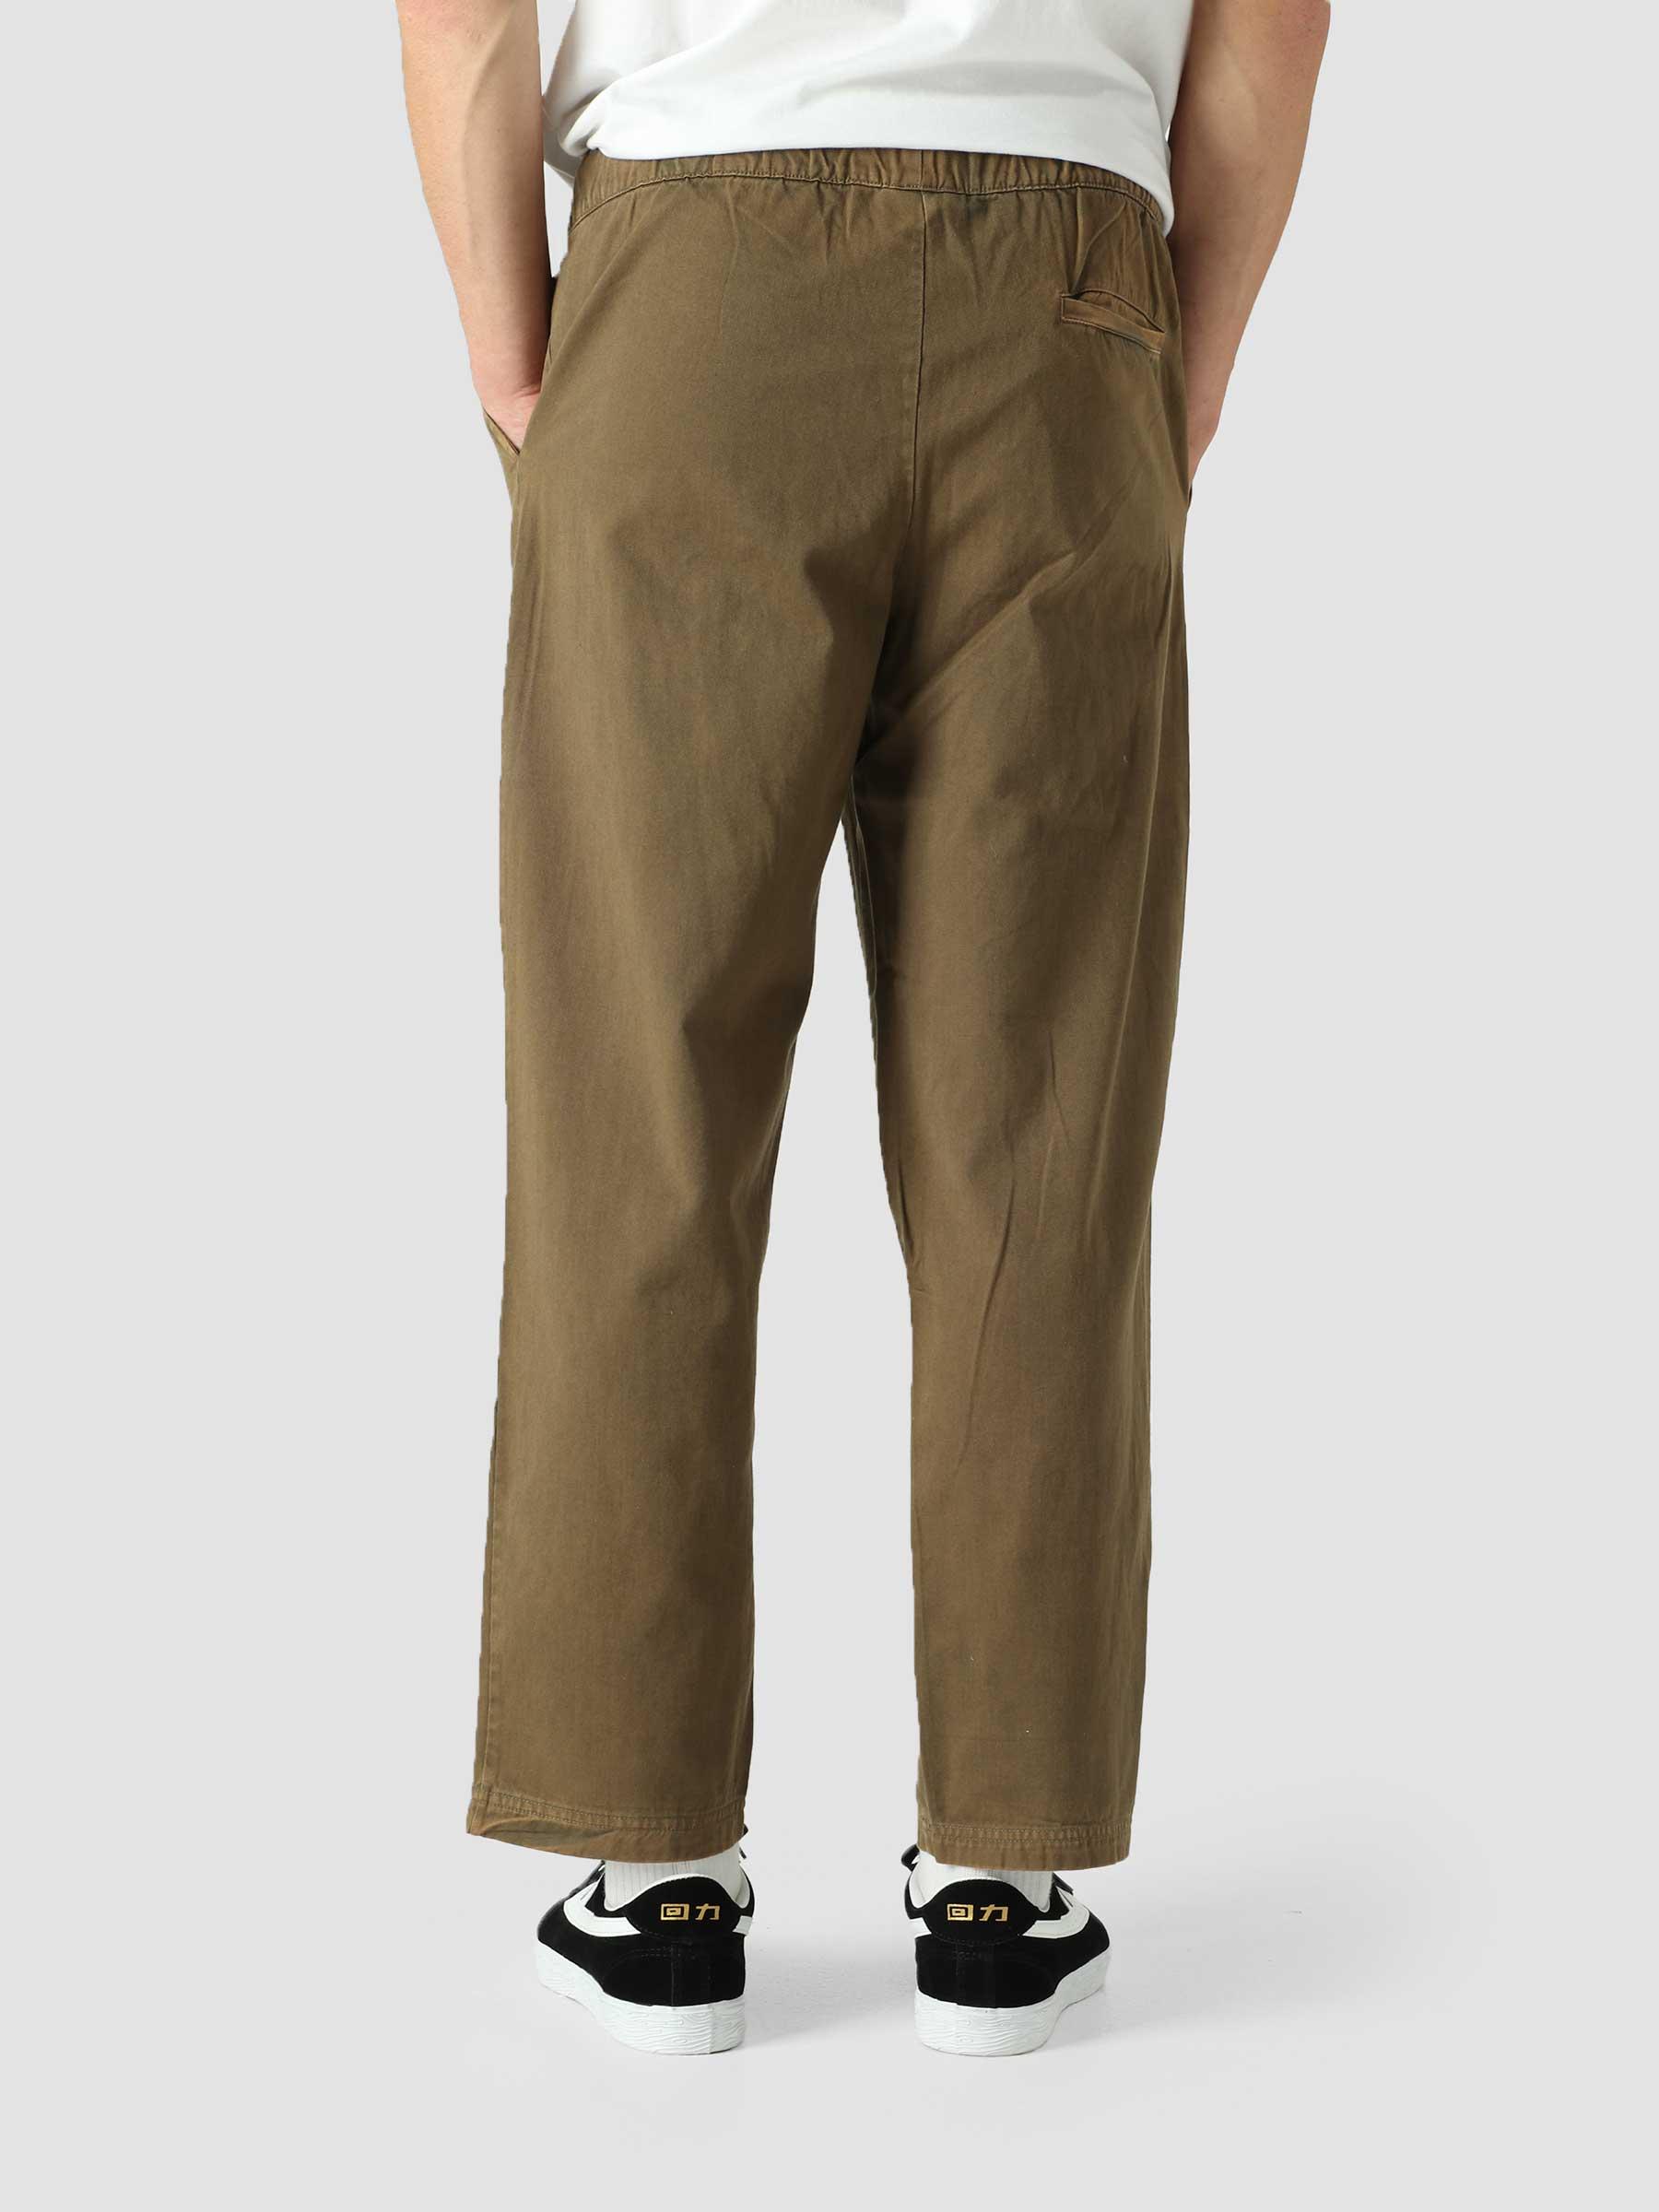 Cotton Twill Pants Dark Olive COWO8Q-GS556